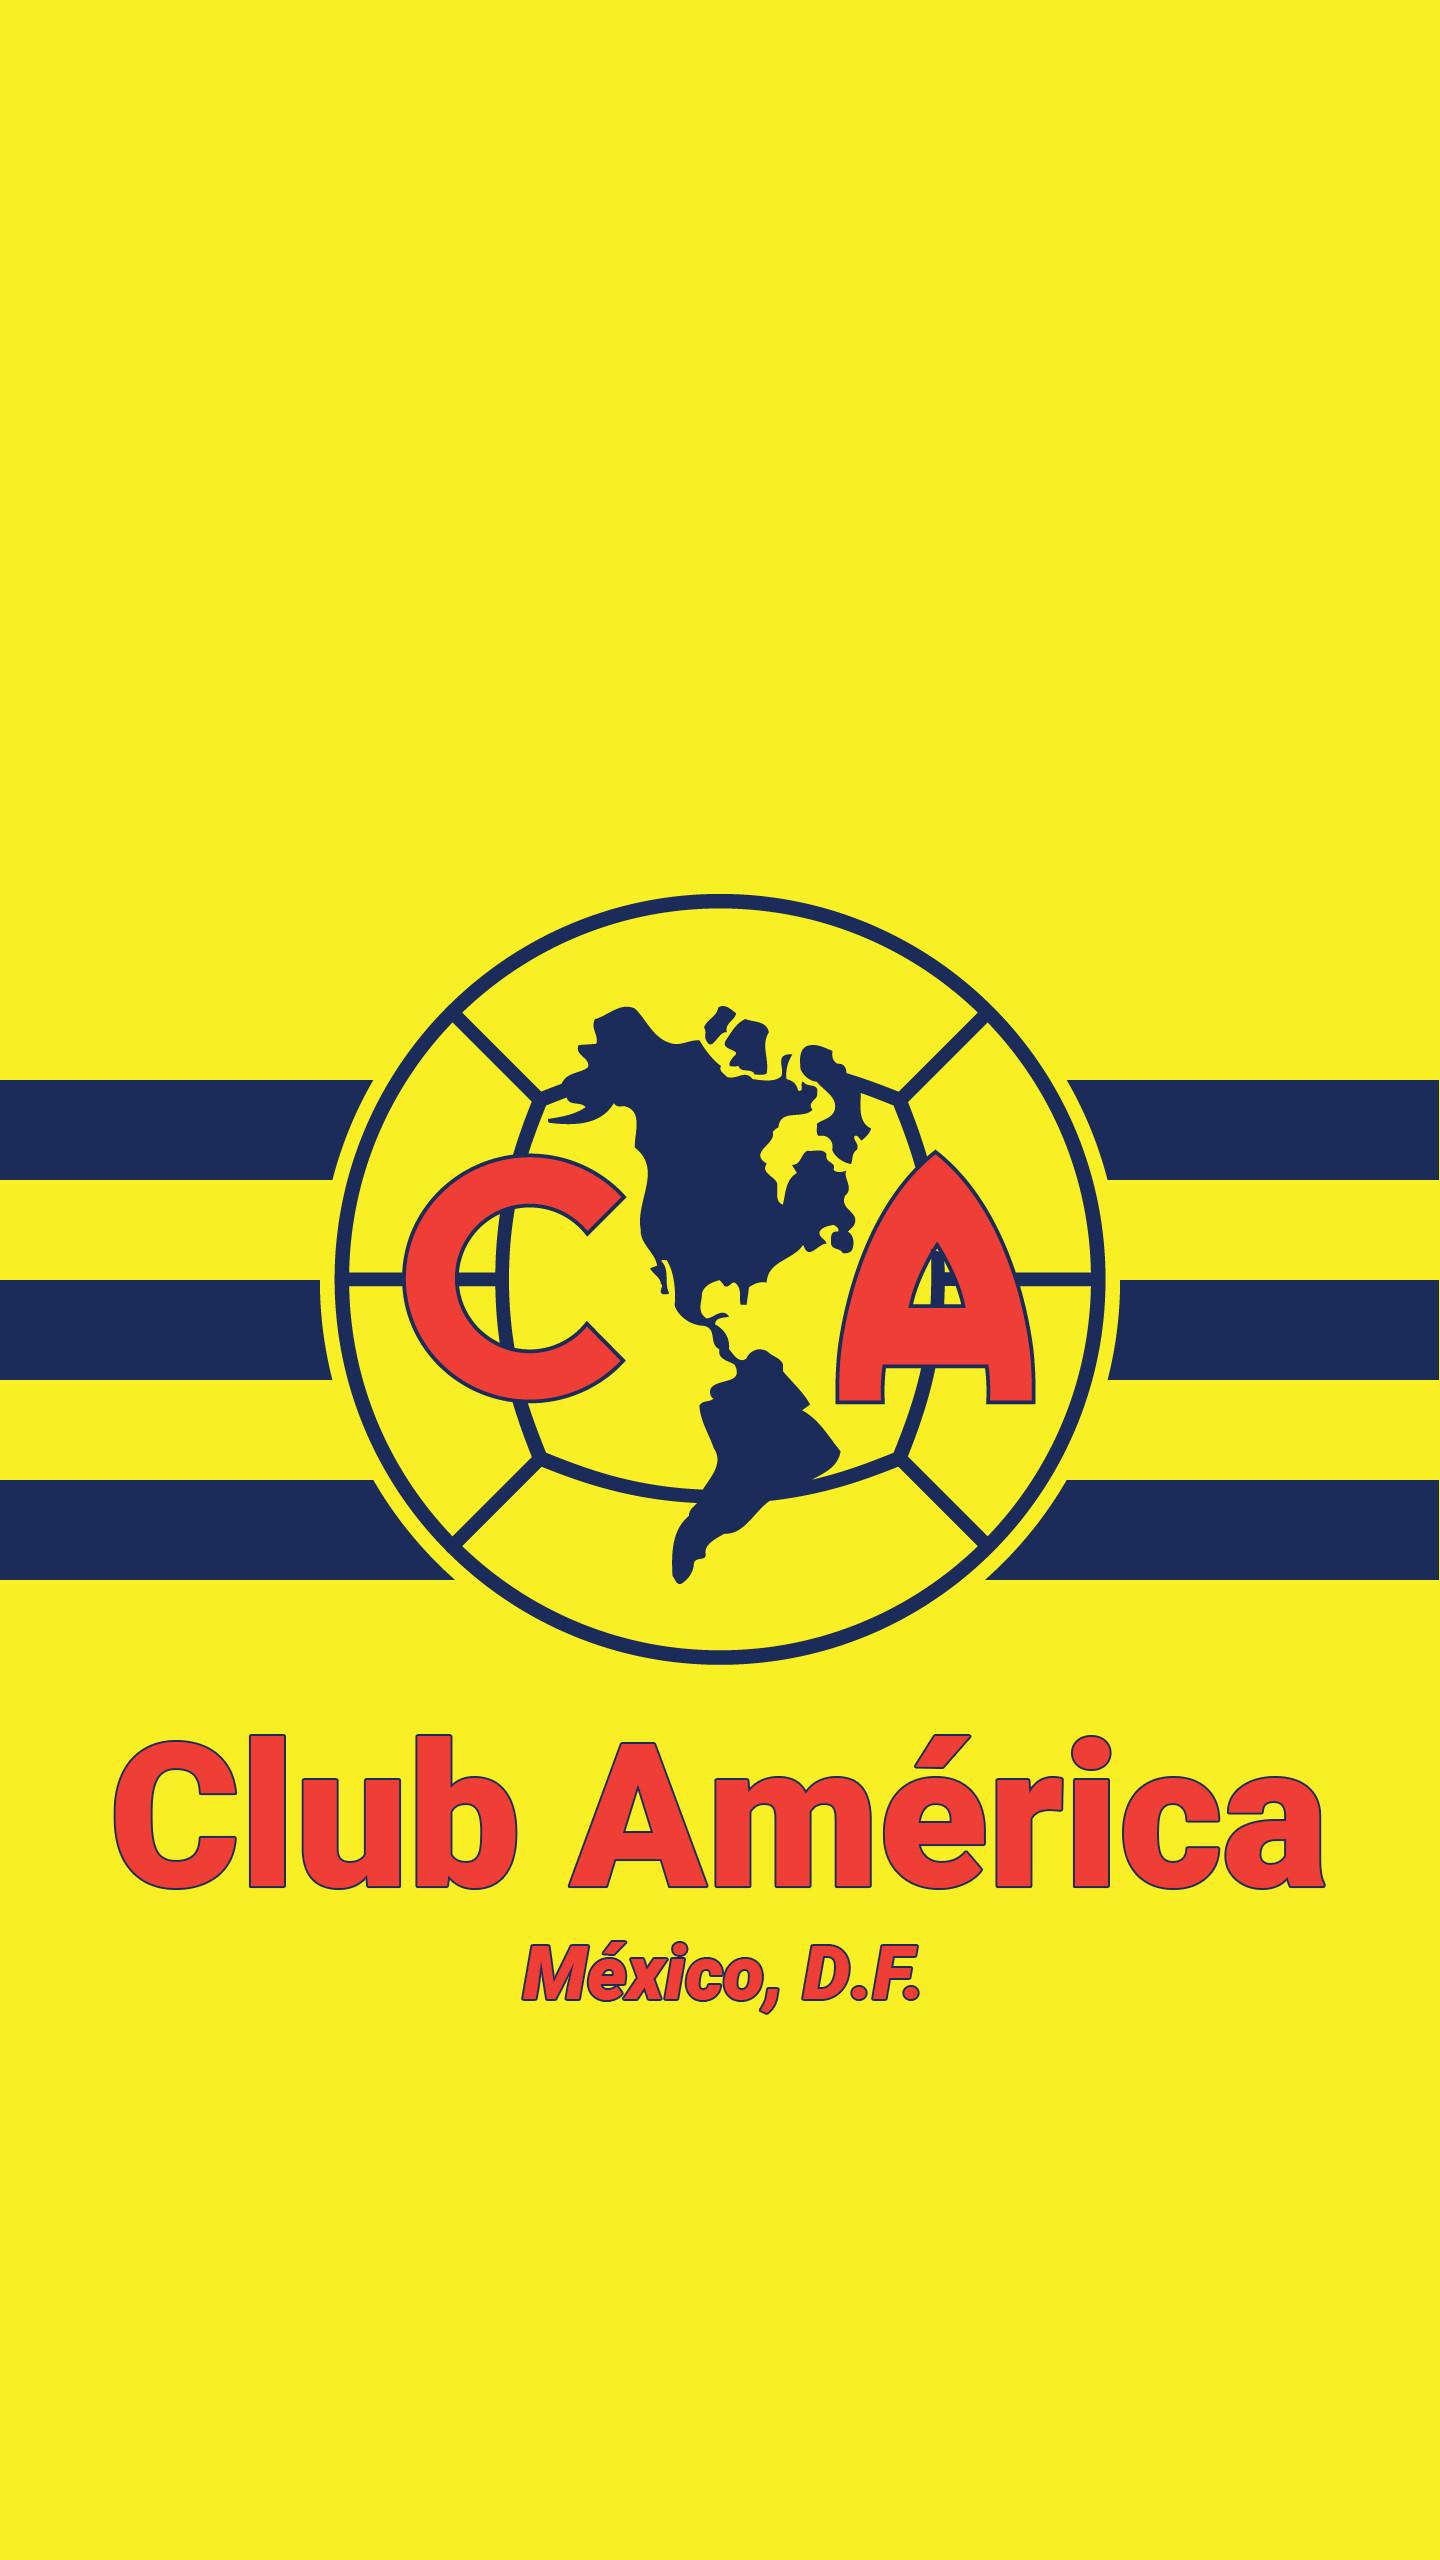 Club America Wallpaper …